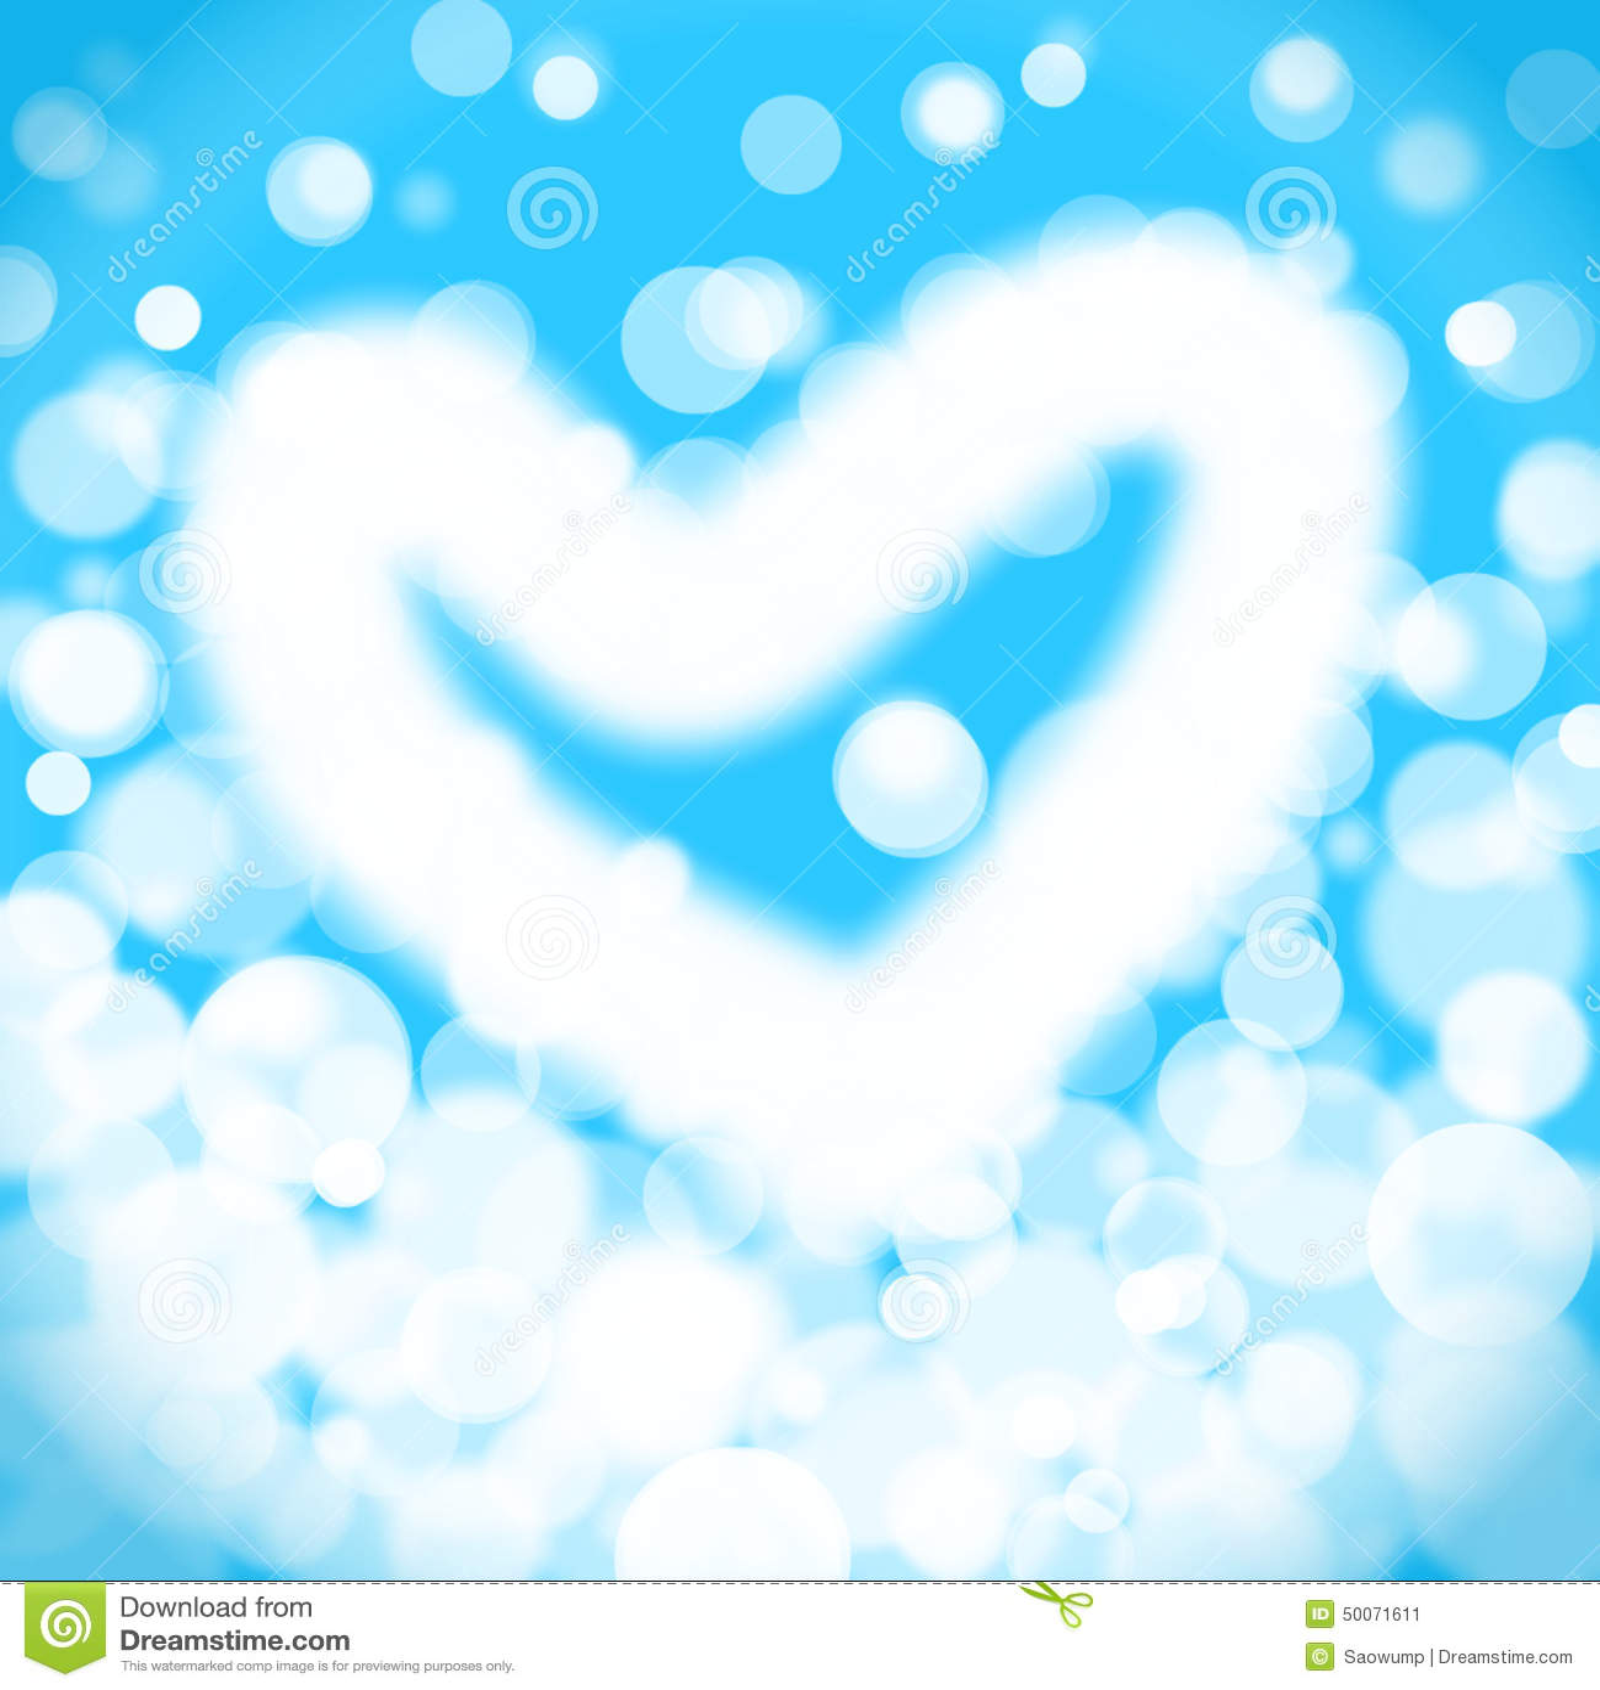 light blue heart background - photo #24